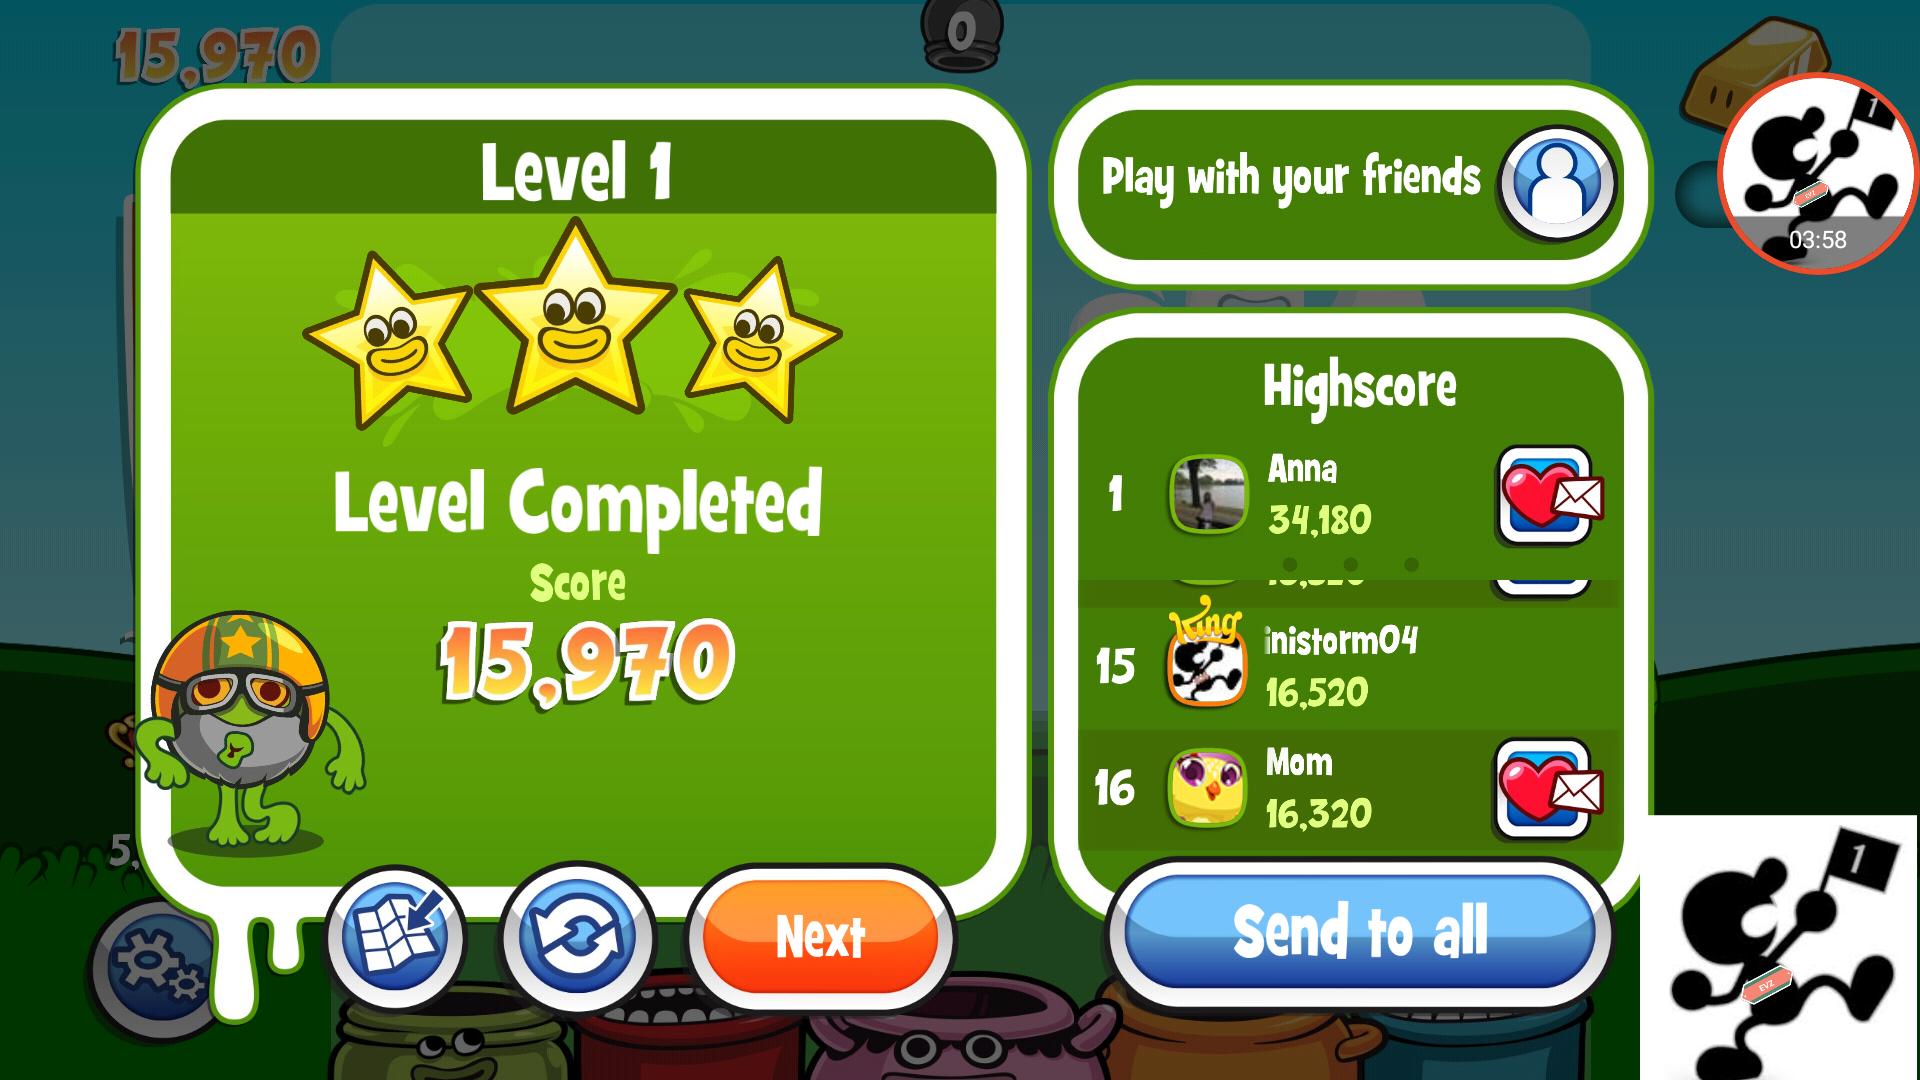 Papa Pear Saga: Level 001 15,970 points